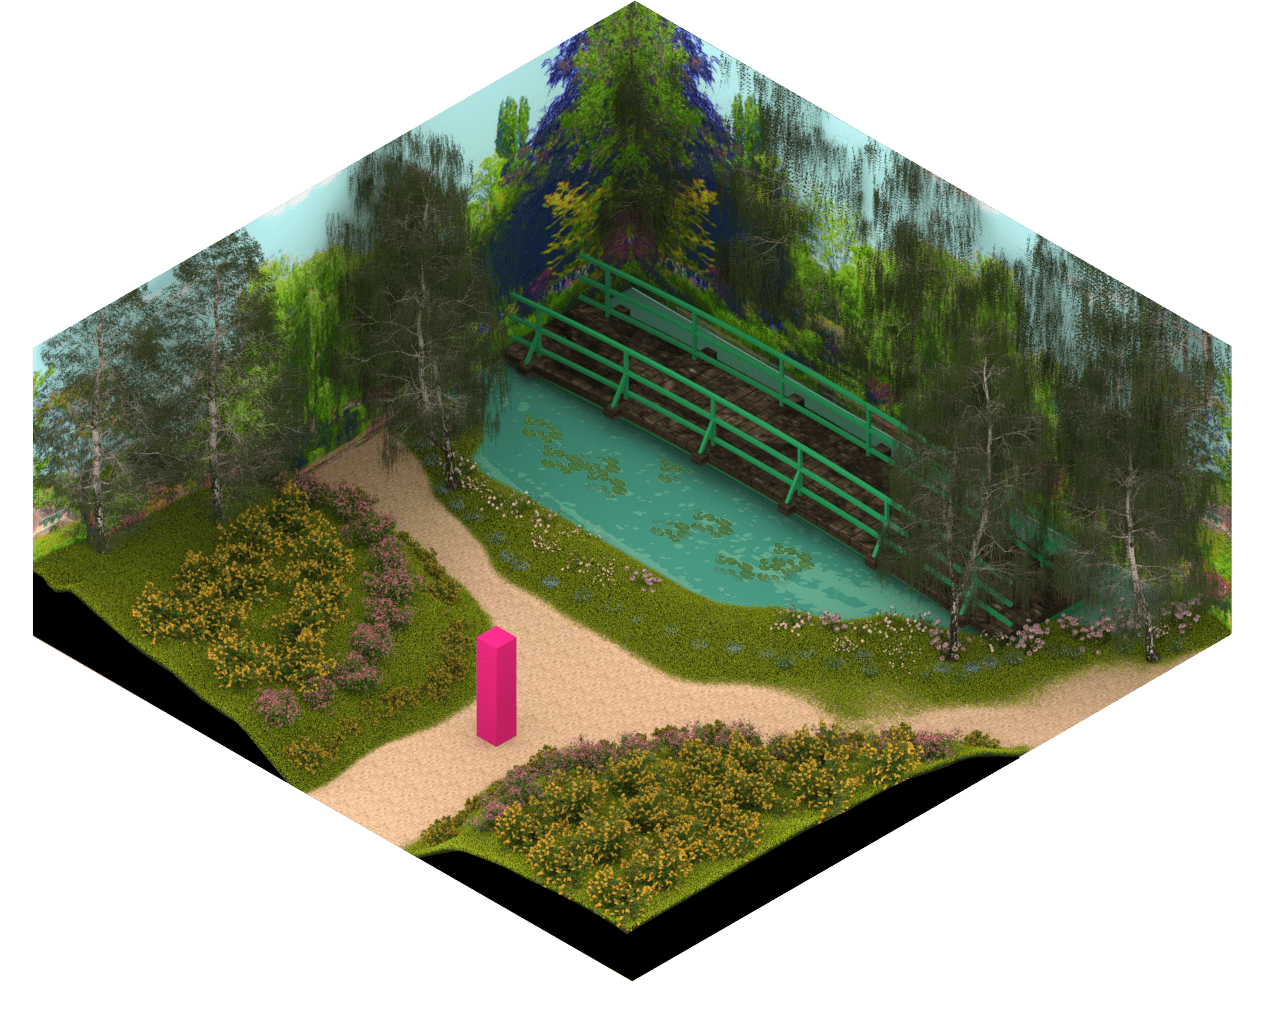 3D model of Monet's Garden.